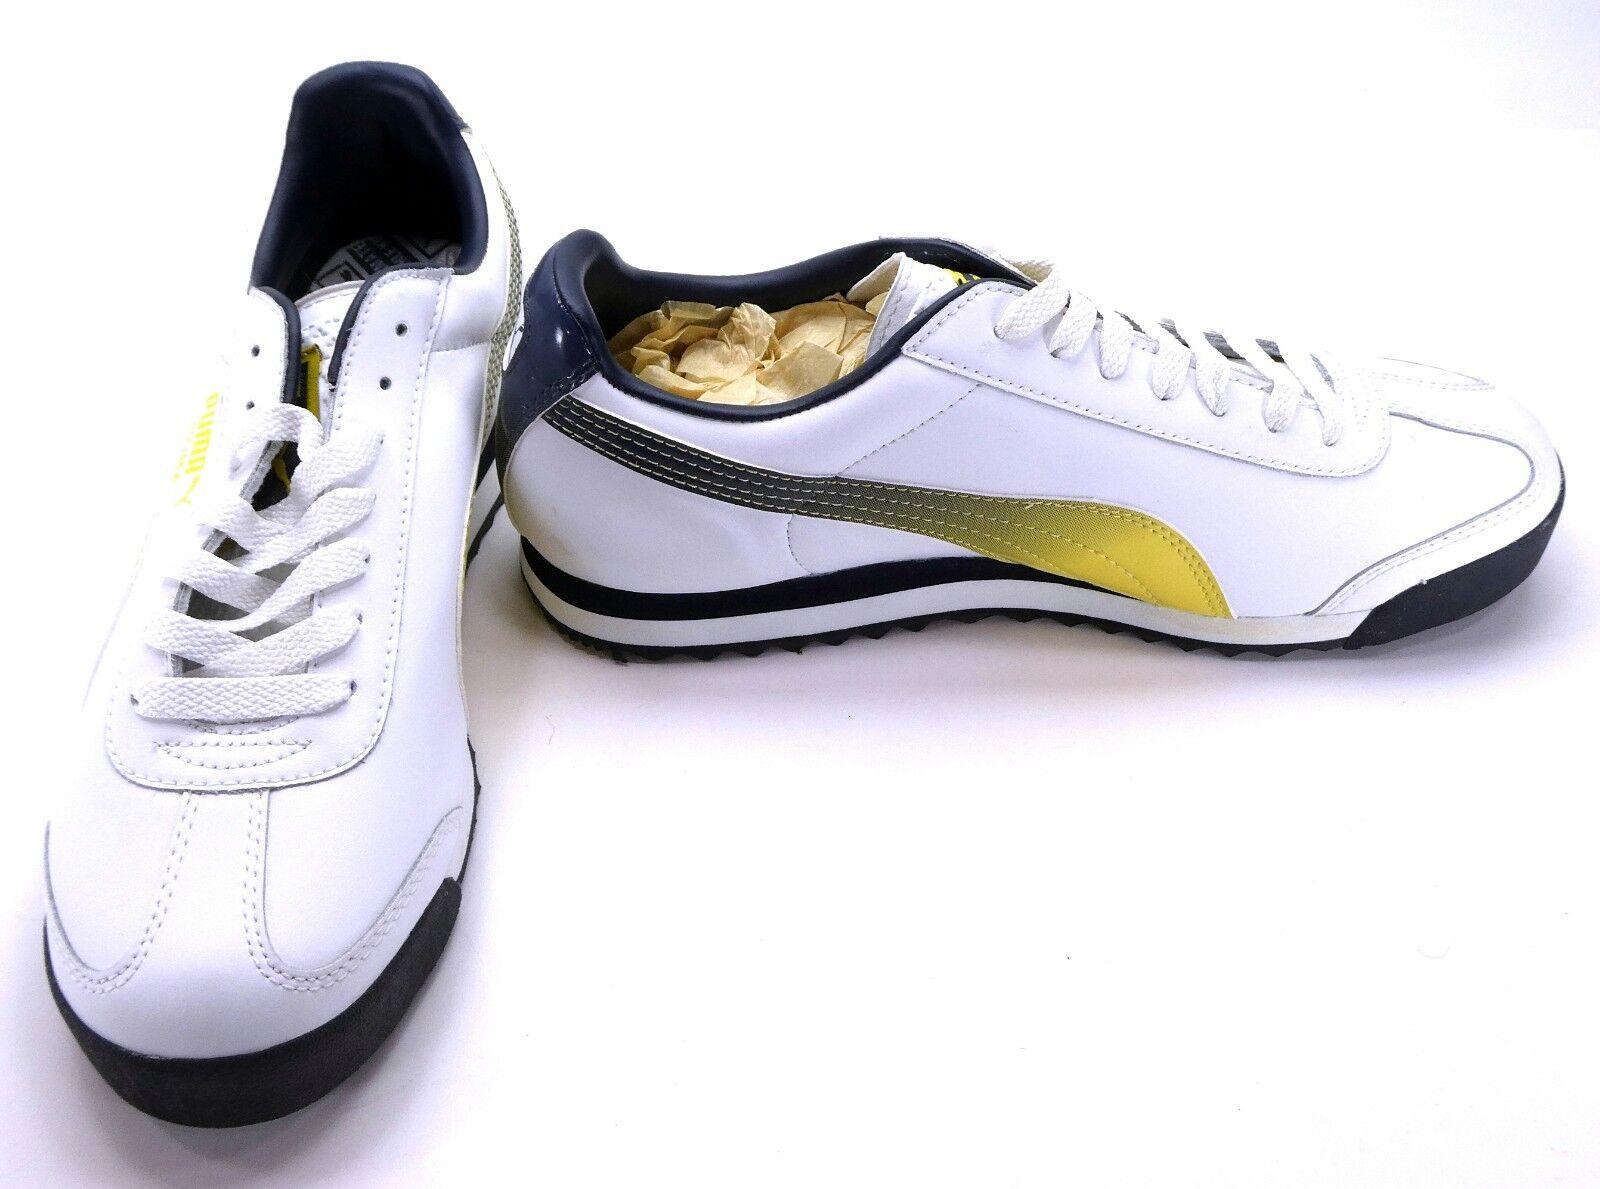 Puma Zapatos Zapatillas Gradient/Negro Roma Atlético Blanco/Amarillo Gradient/Negro Zapatillas 5c726a